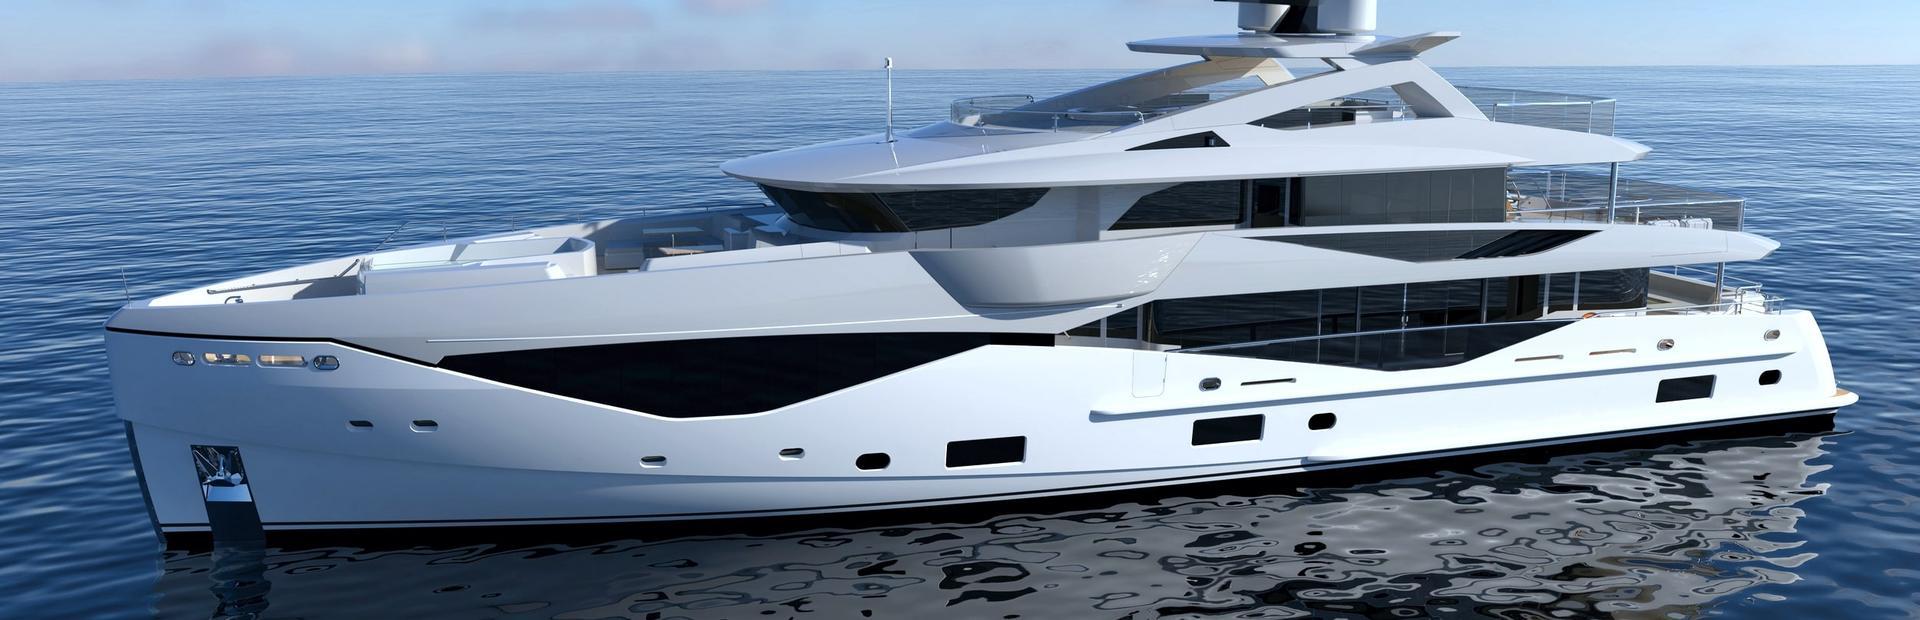 Ocean Club 42 Yacht Charter